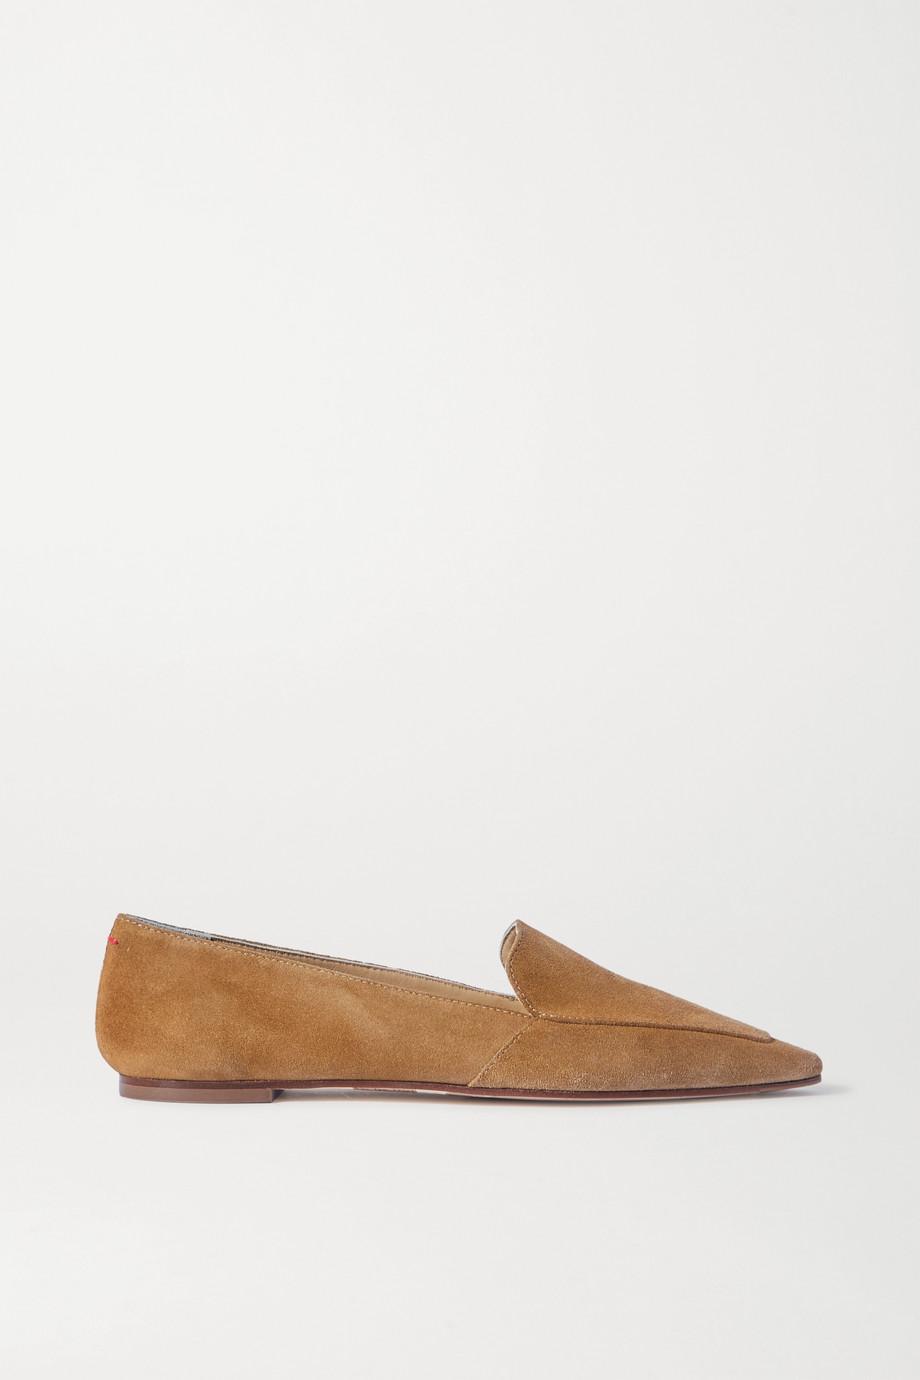 aeyde Aurora suede loafers